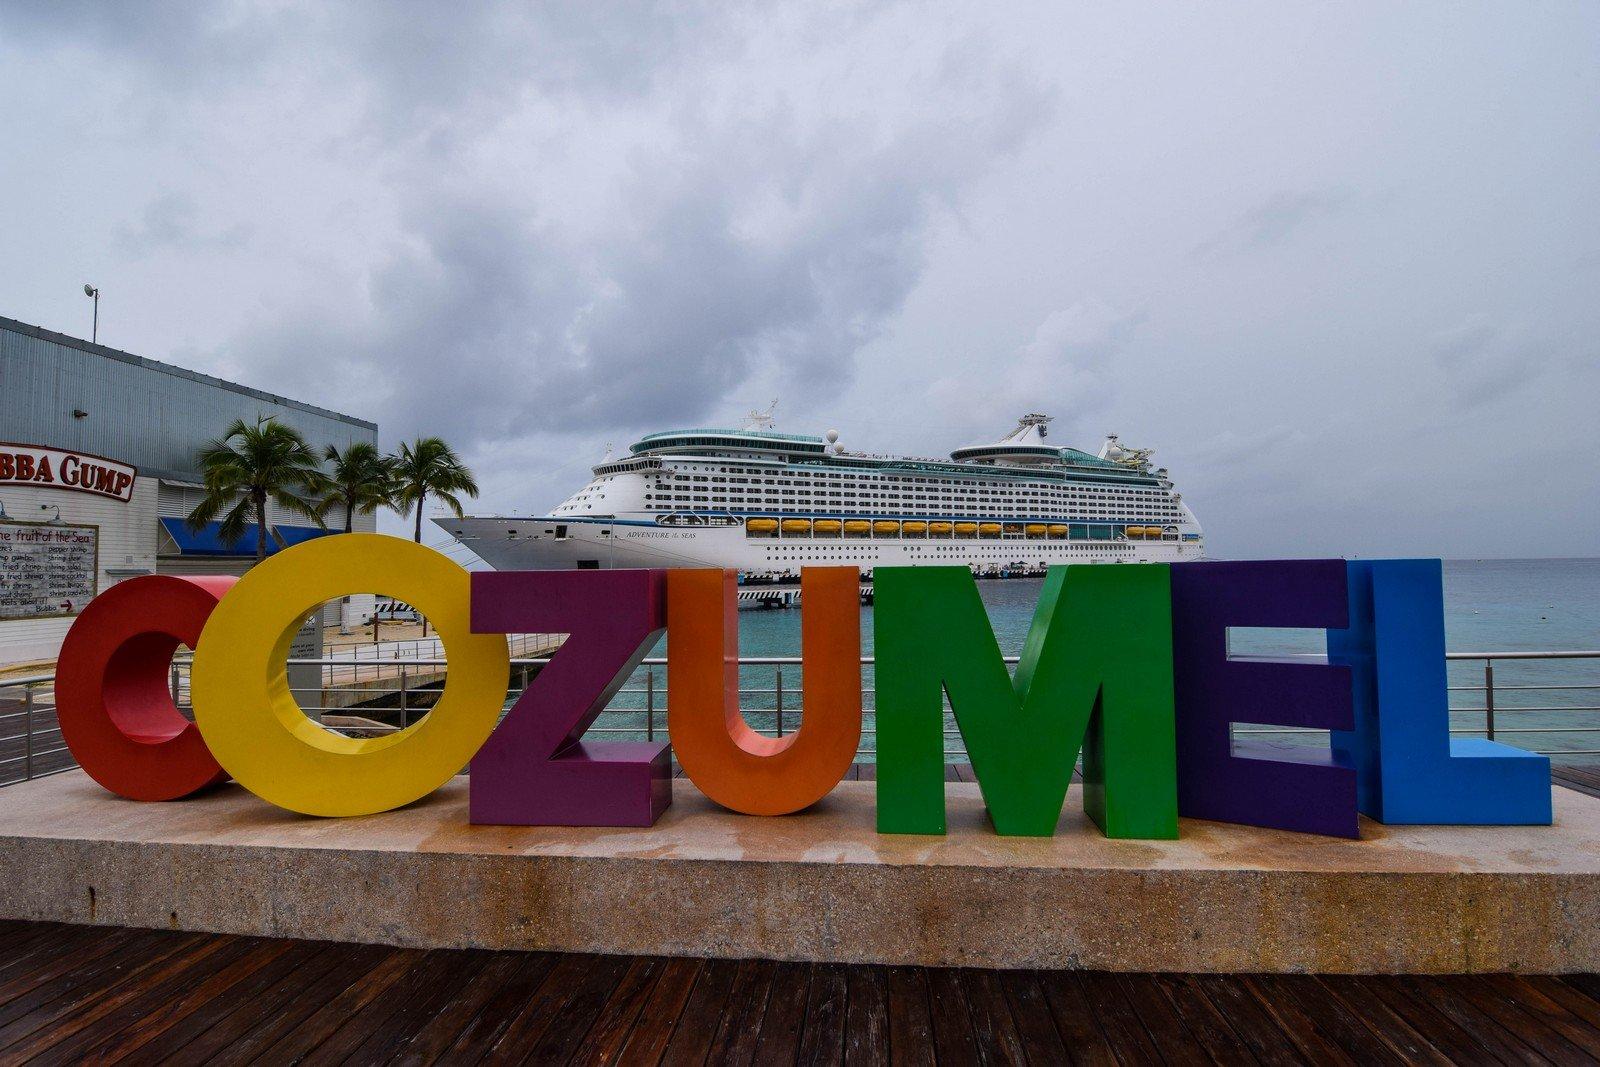 Adventure of the Seas Live Blog - Day 5 - Cozumel